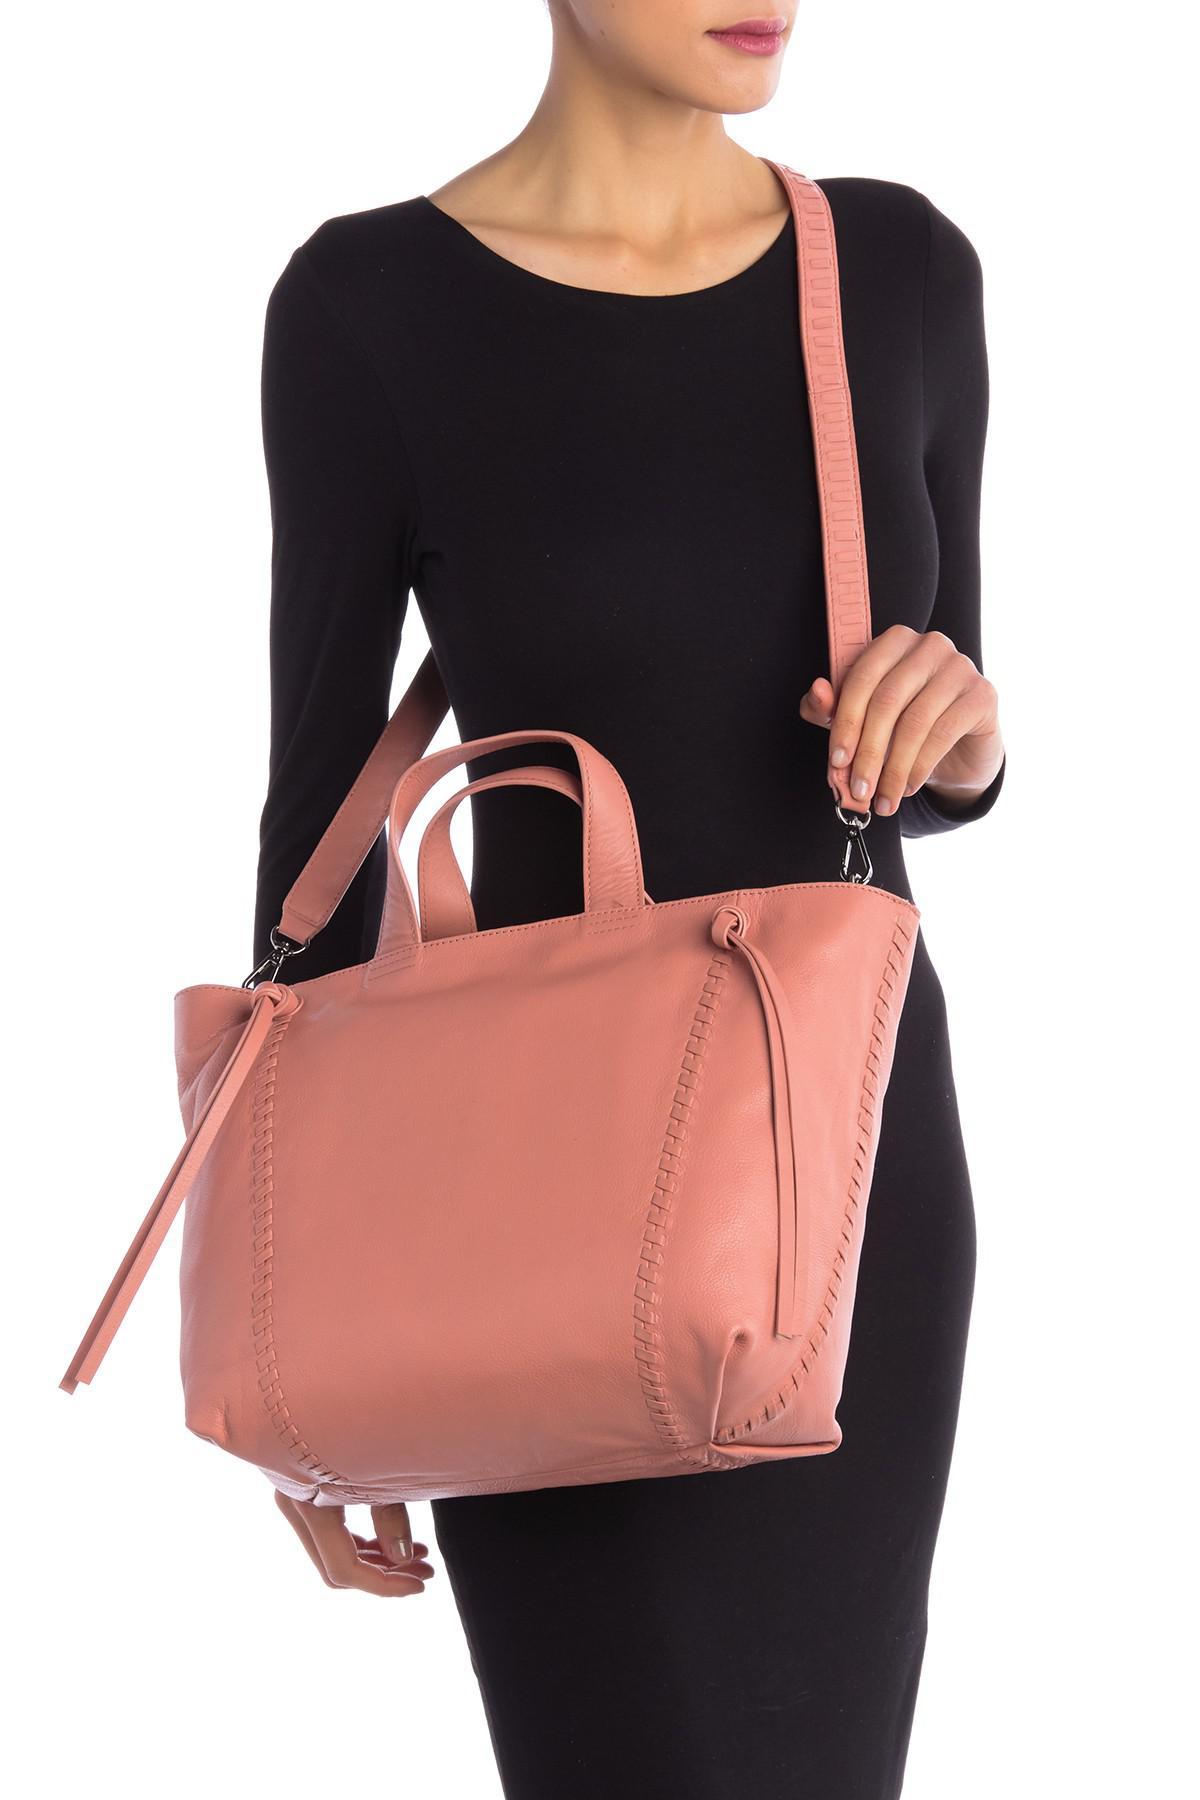 c8a72d044741 Kooba Multicolor Limon Leather Tote Bag